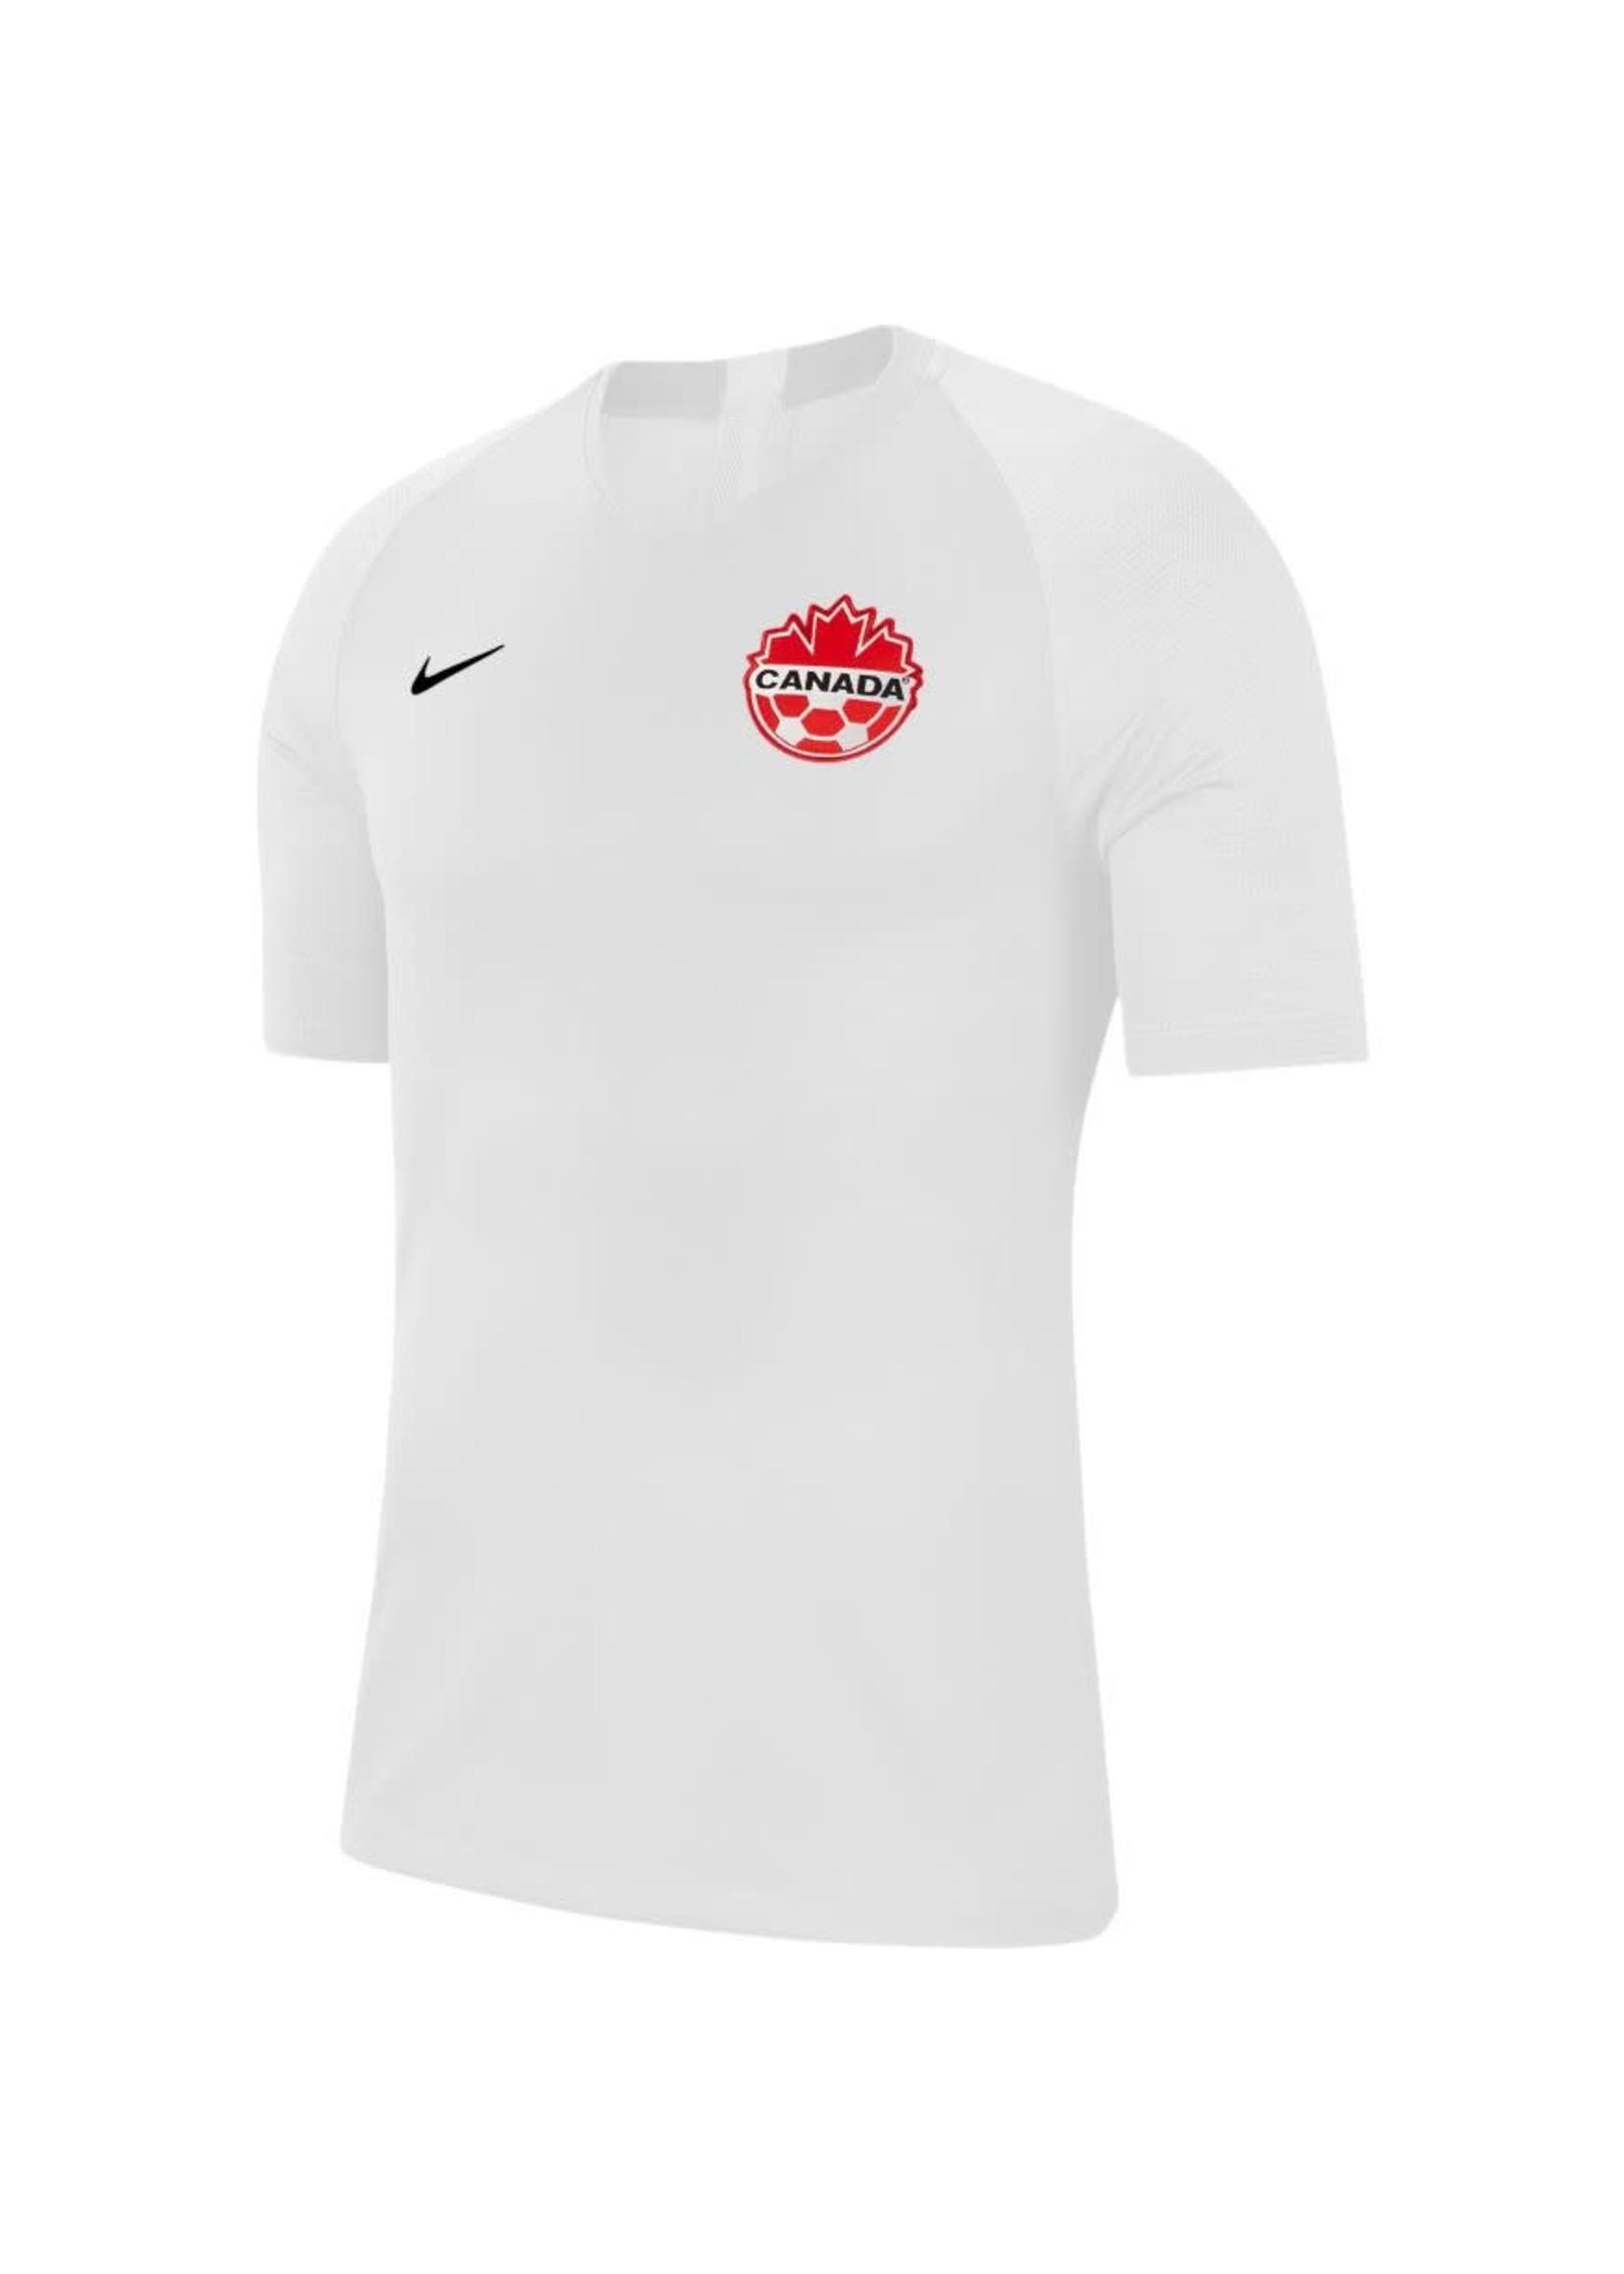 Nike Canada 19/20 Away Jersey Adult